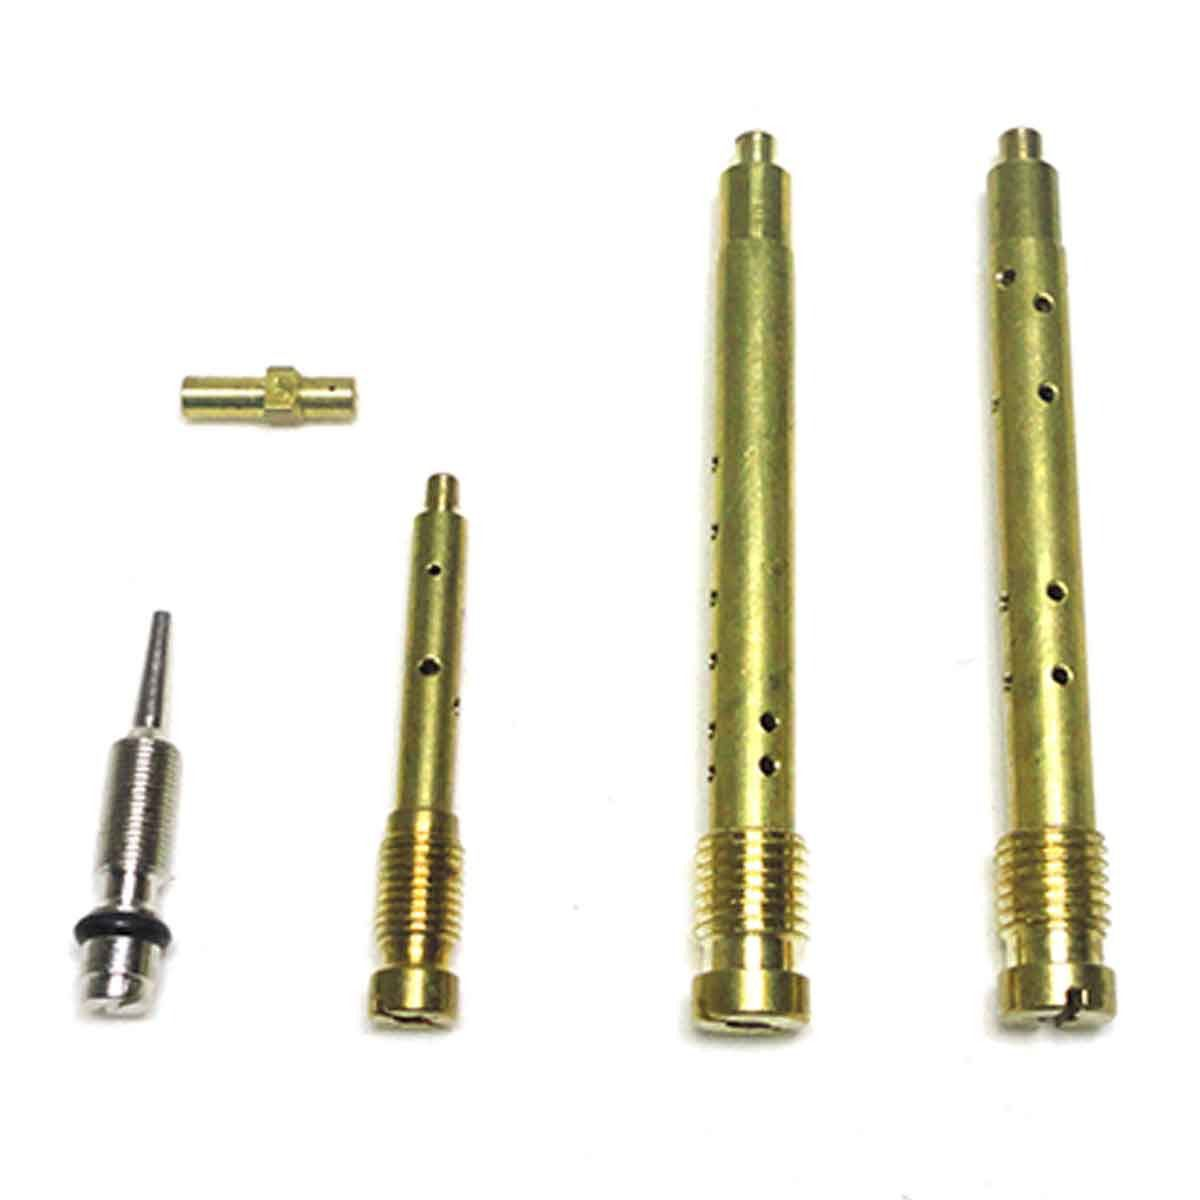 Kit Gicle Carburador 30/34 BLFA Escort Hobby 1.0 Gasolina